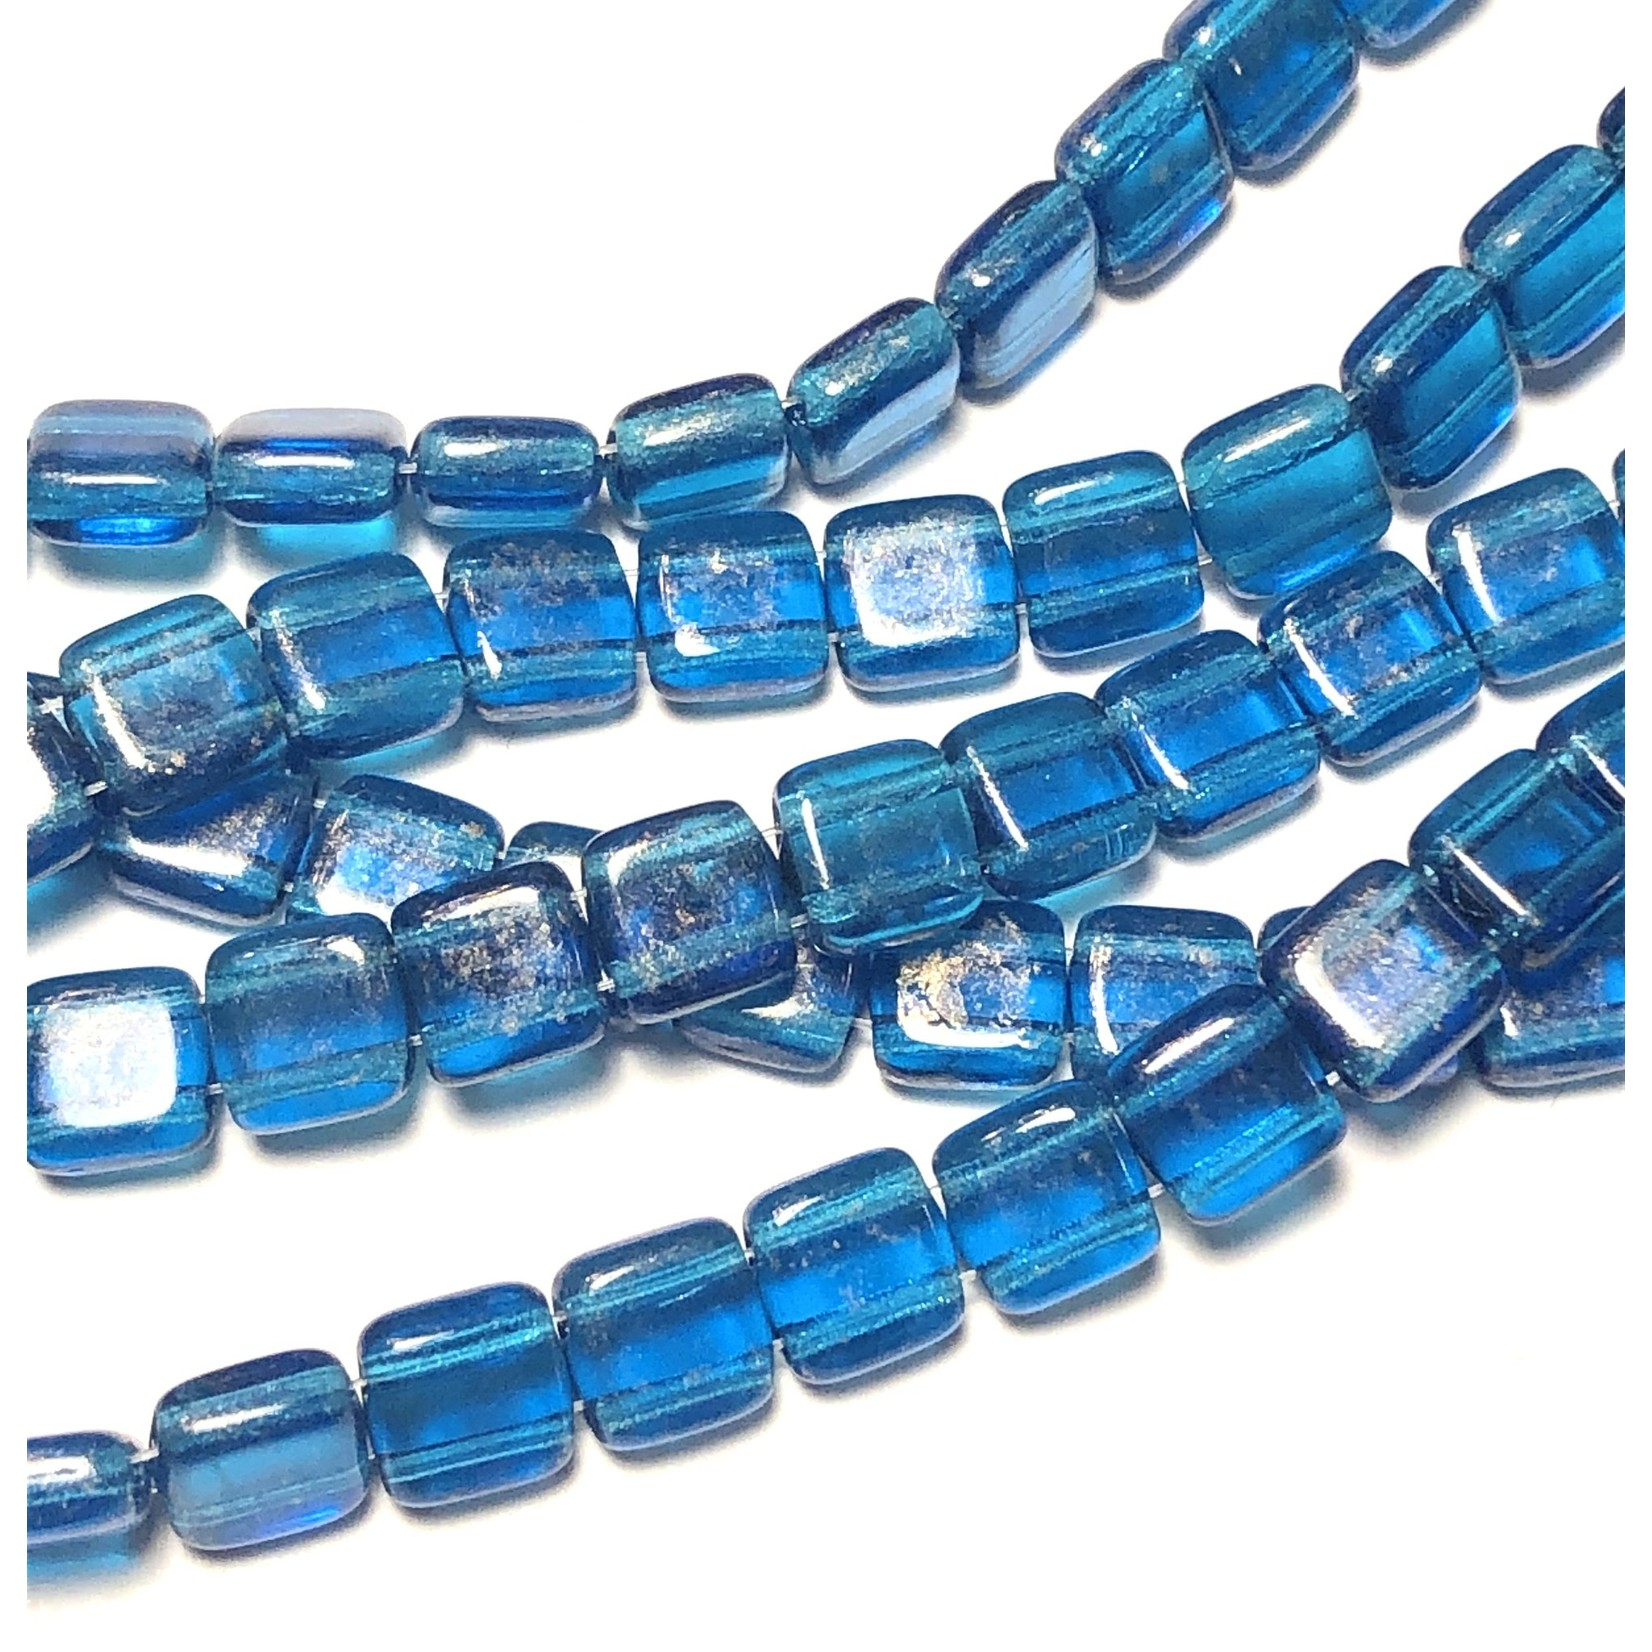 CzechMates CzechMates TILE Gold Marbled Capri Blue